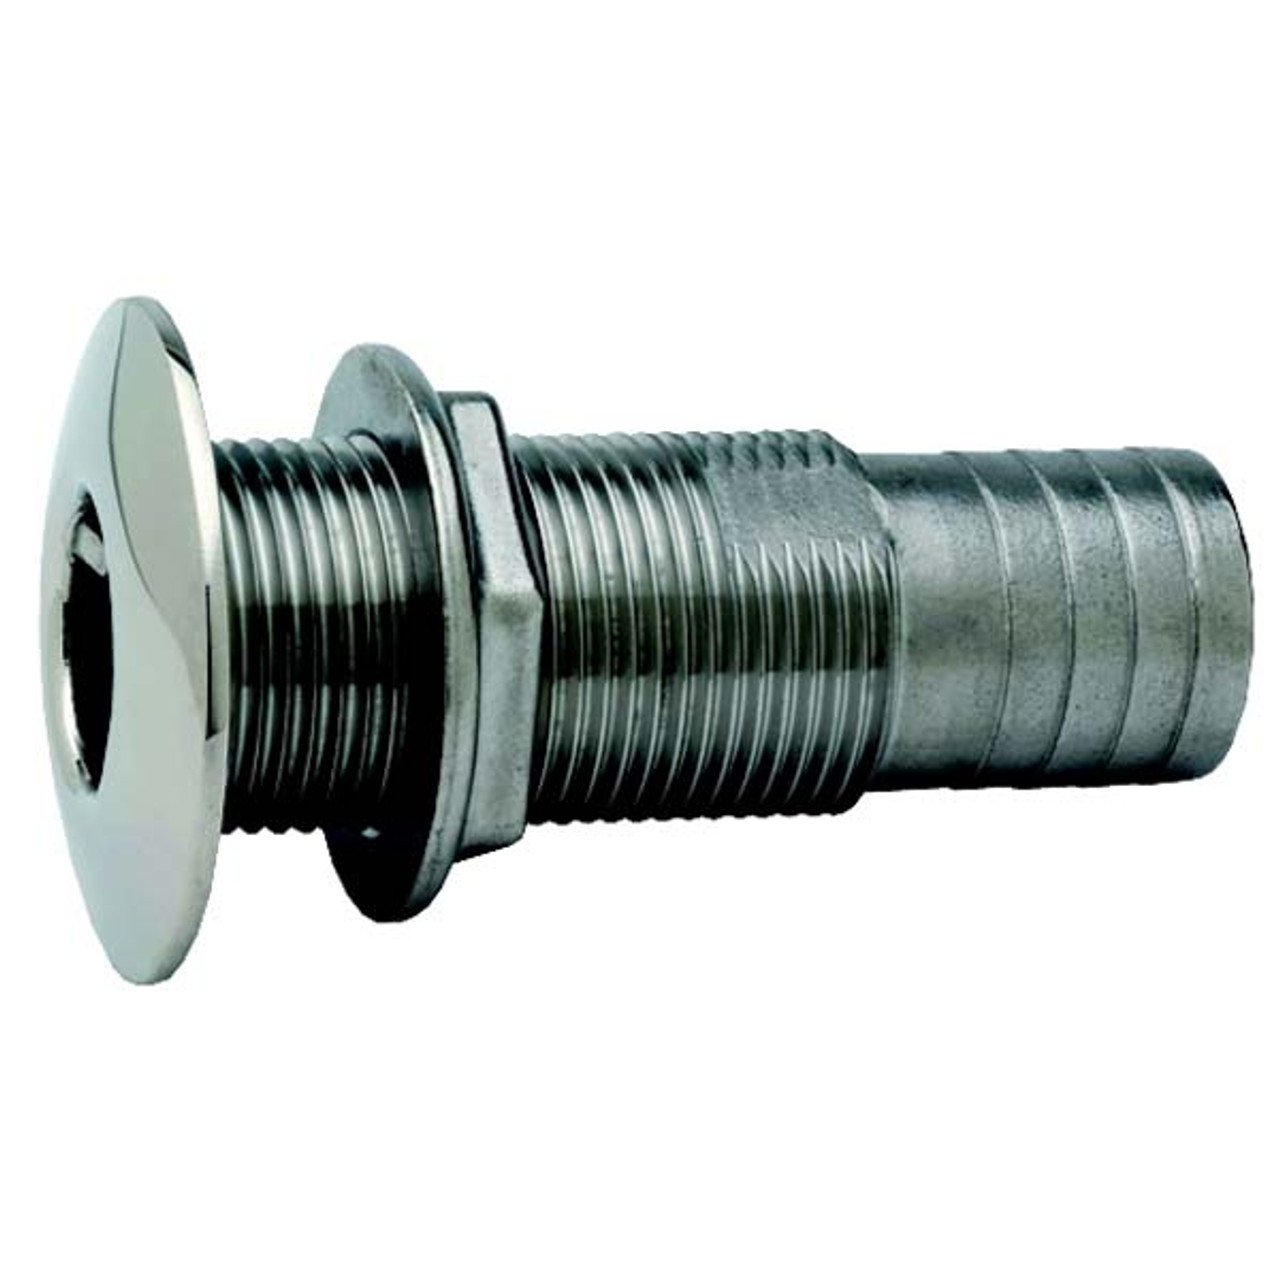 Chromed Straight Thru-Hull Fitting 3//4